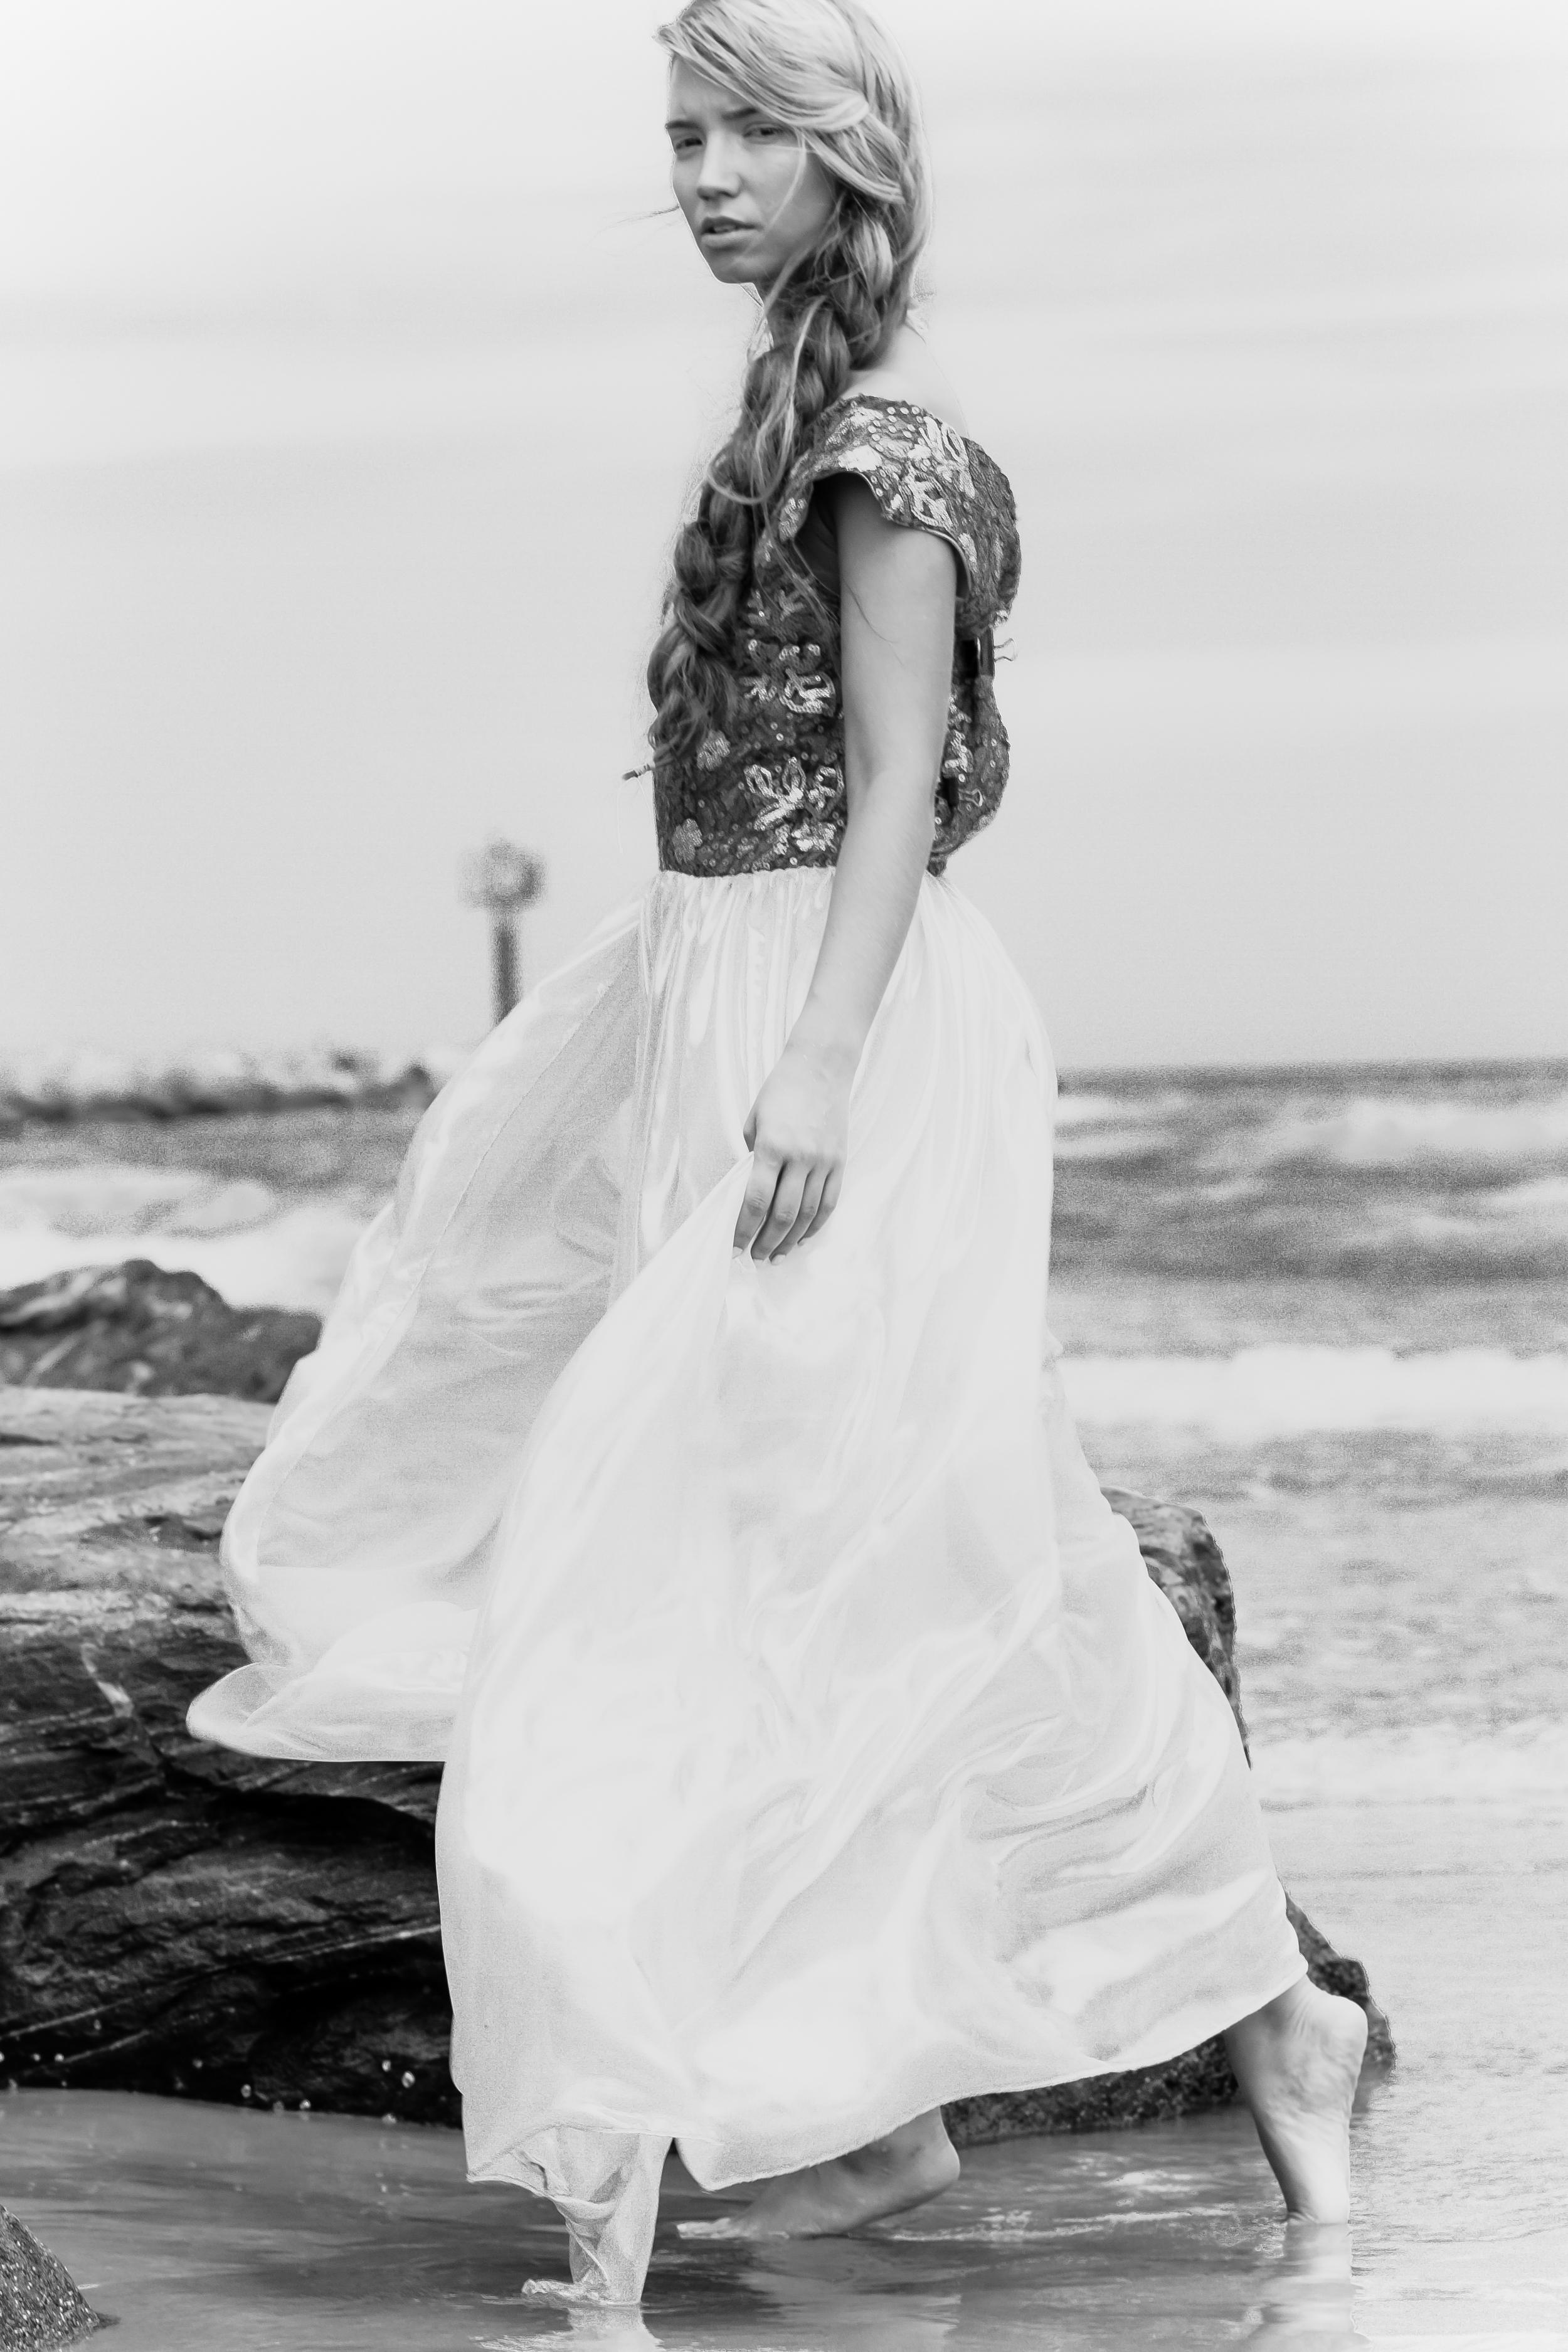 mermaid_desireemarie_vaniaelisephotography--9.jpg